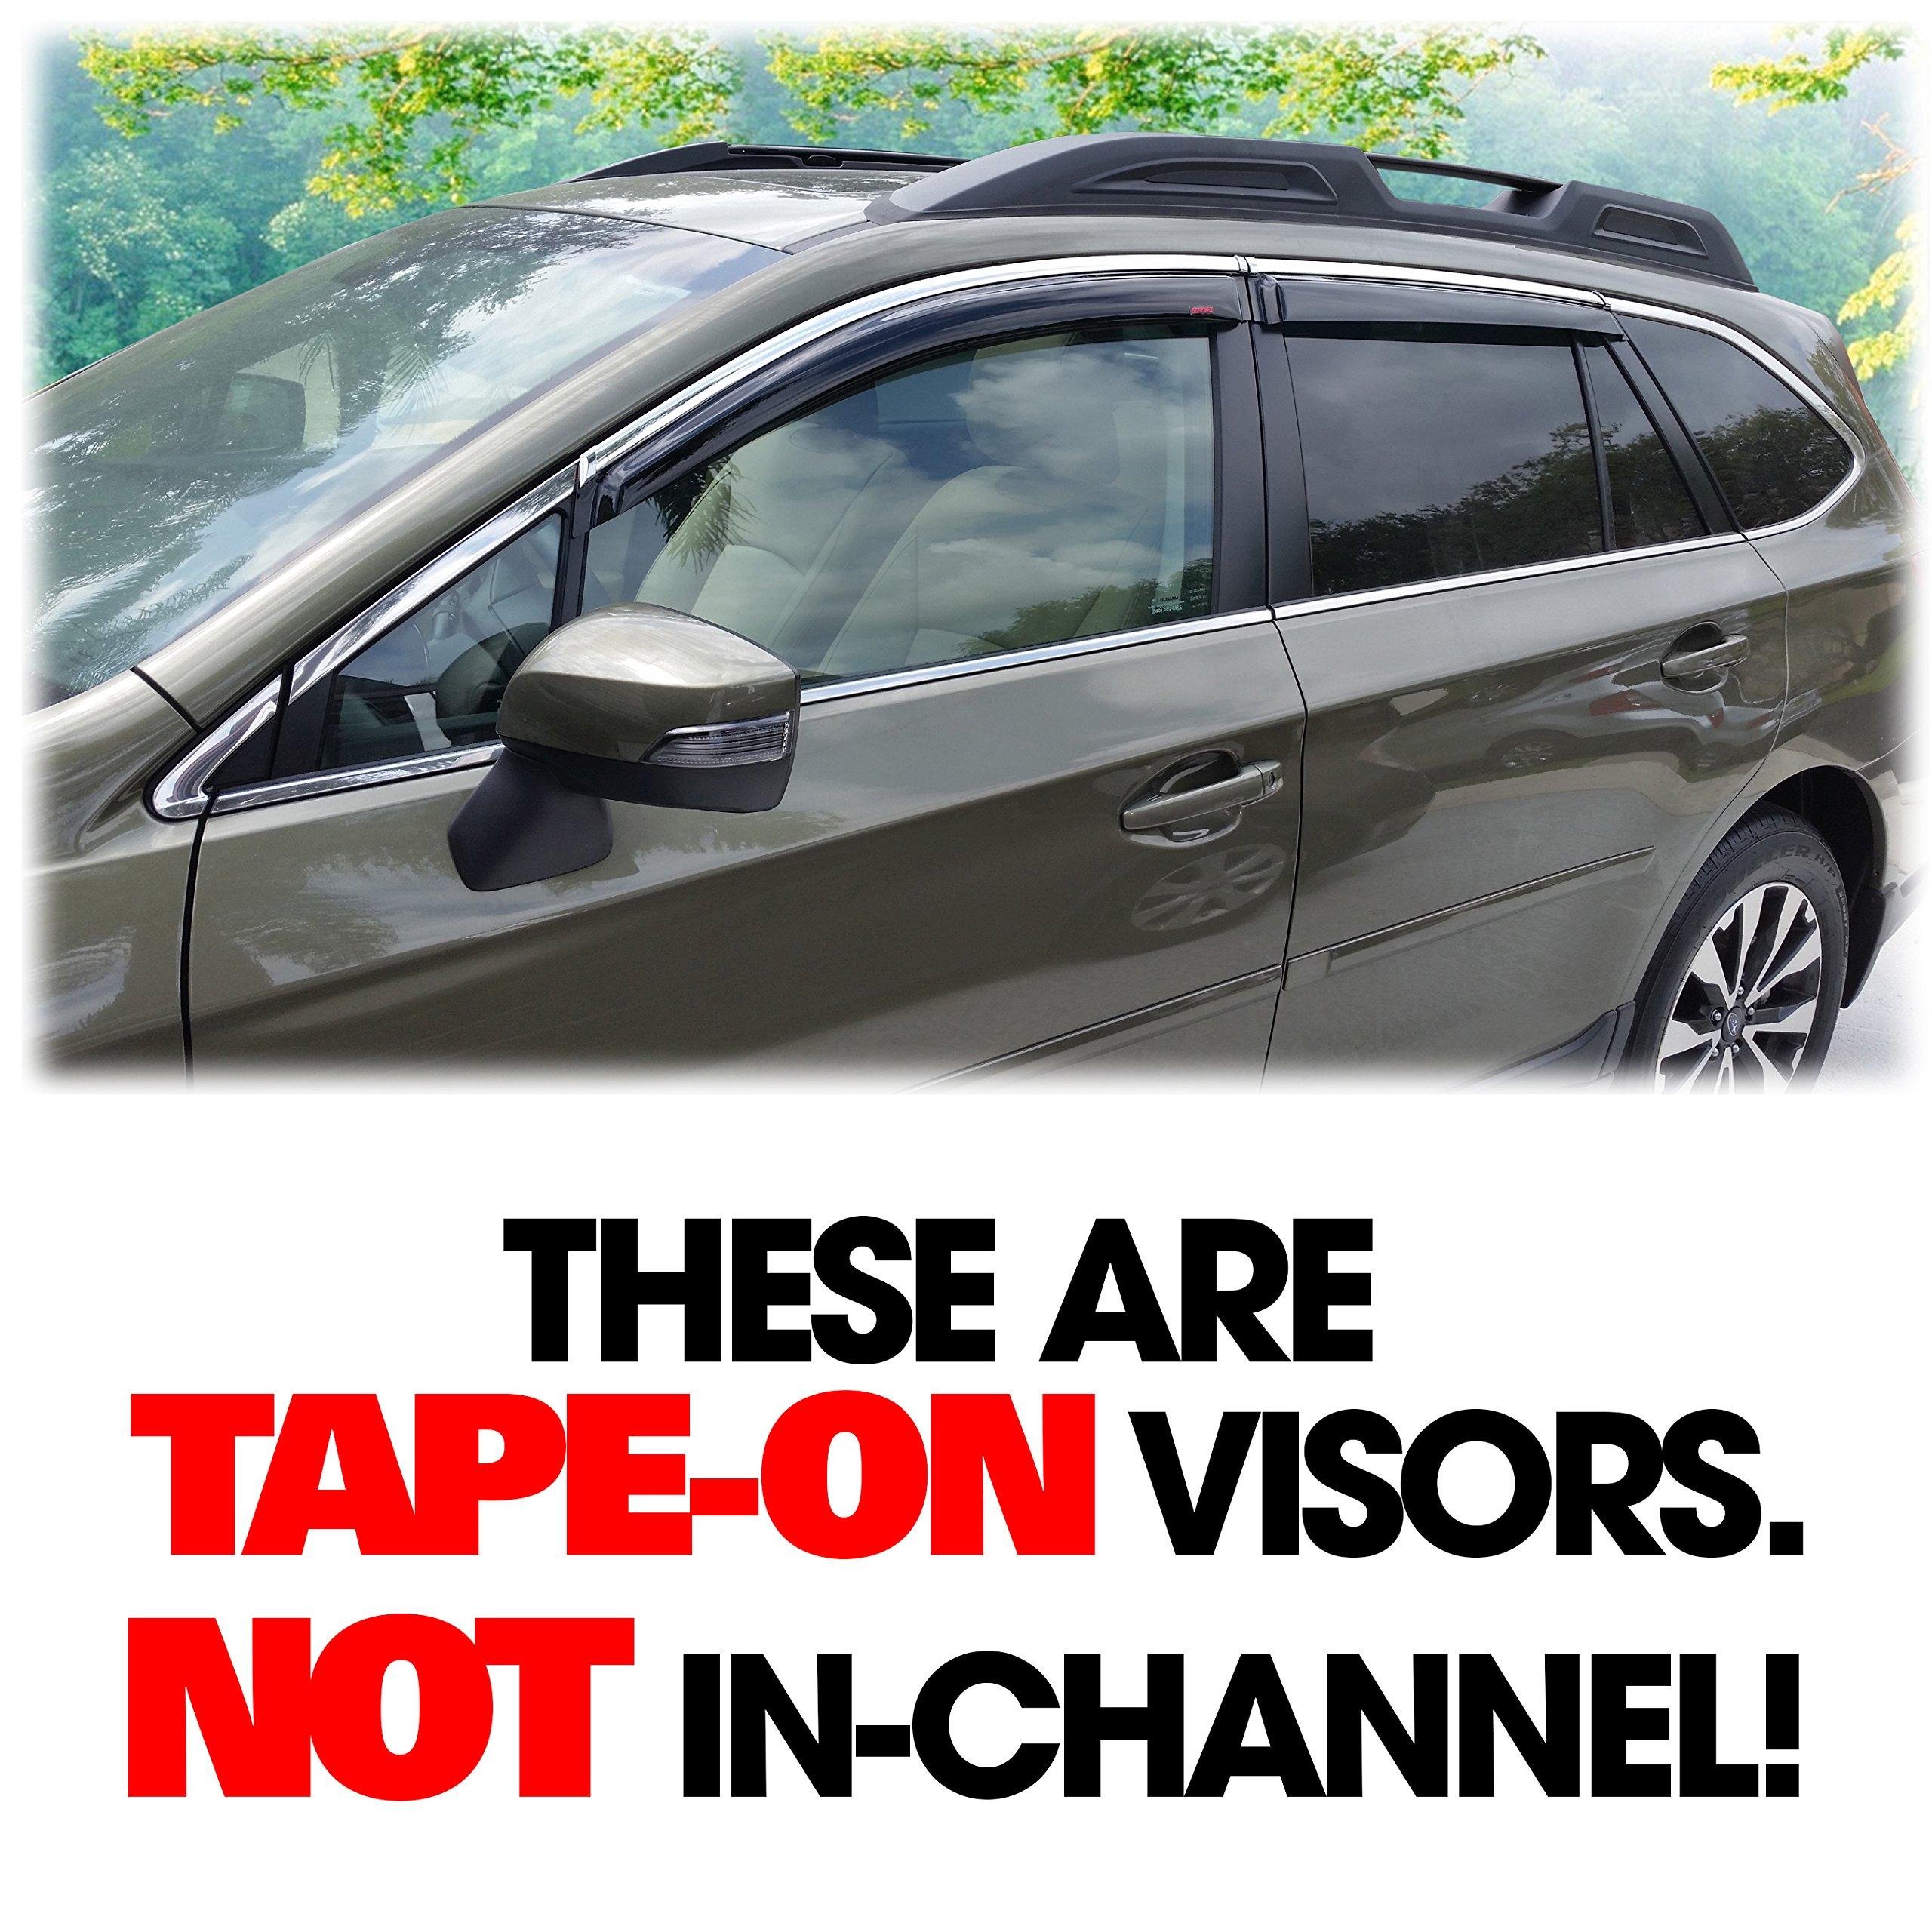 F0010AL500 Genuine OEM Subaru Outback Side Window Deflectors 2015-2018